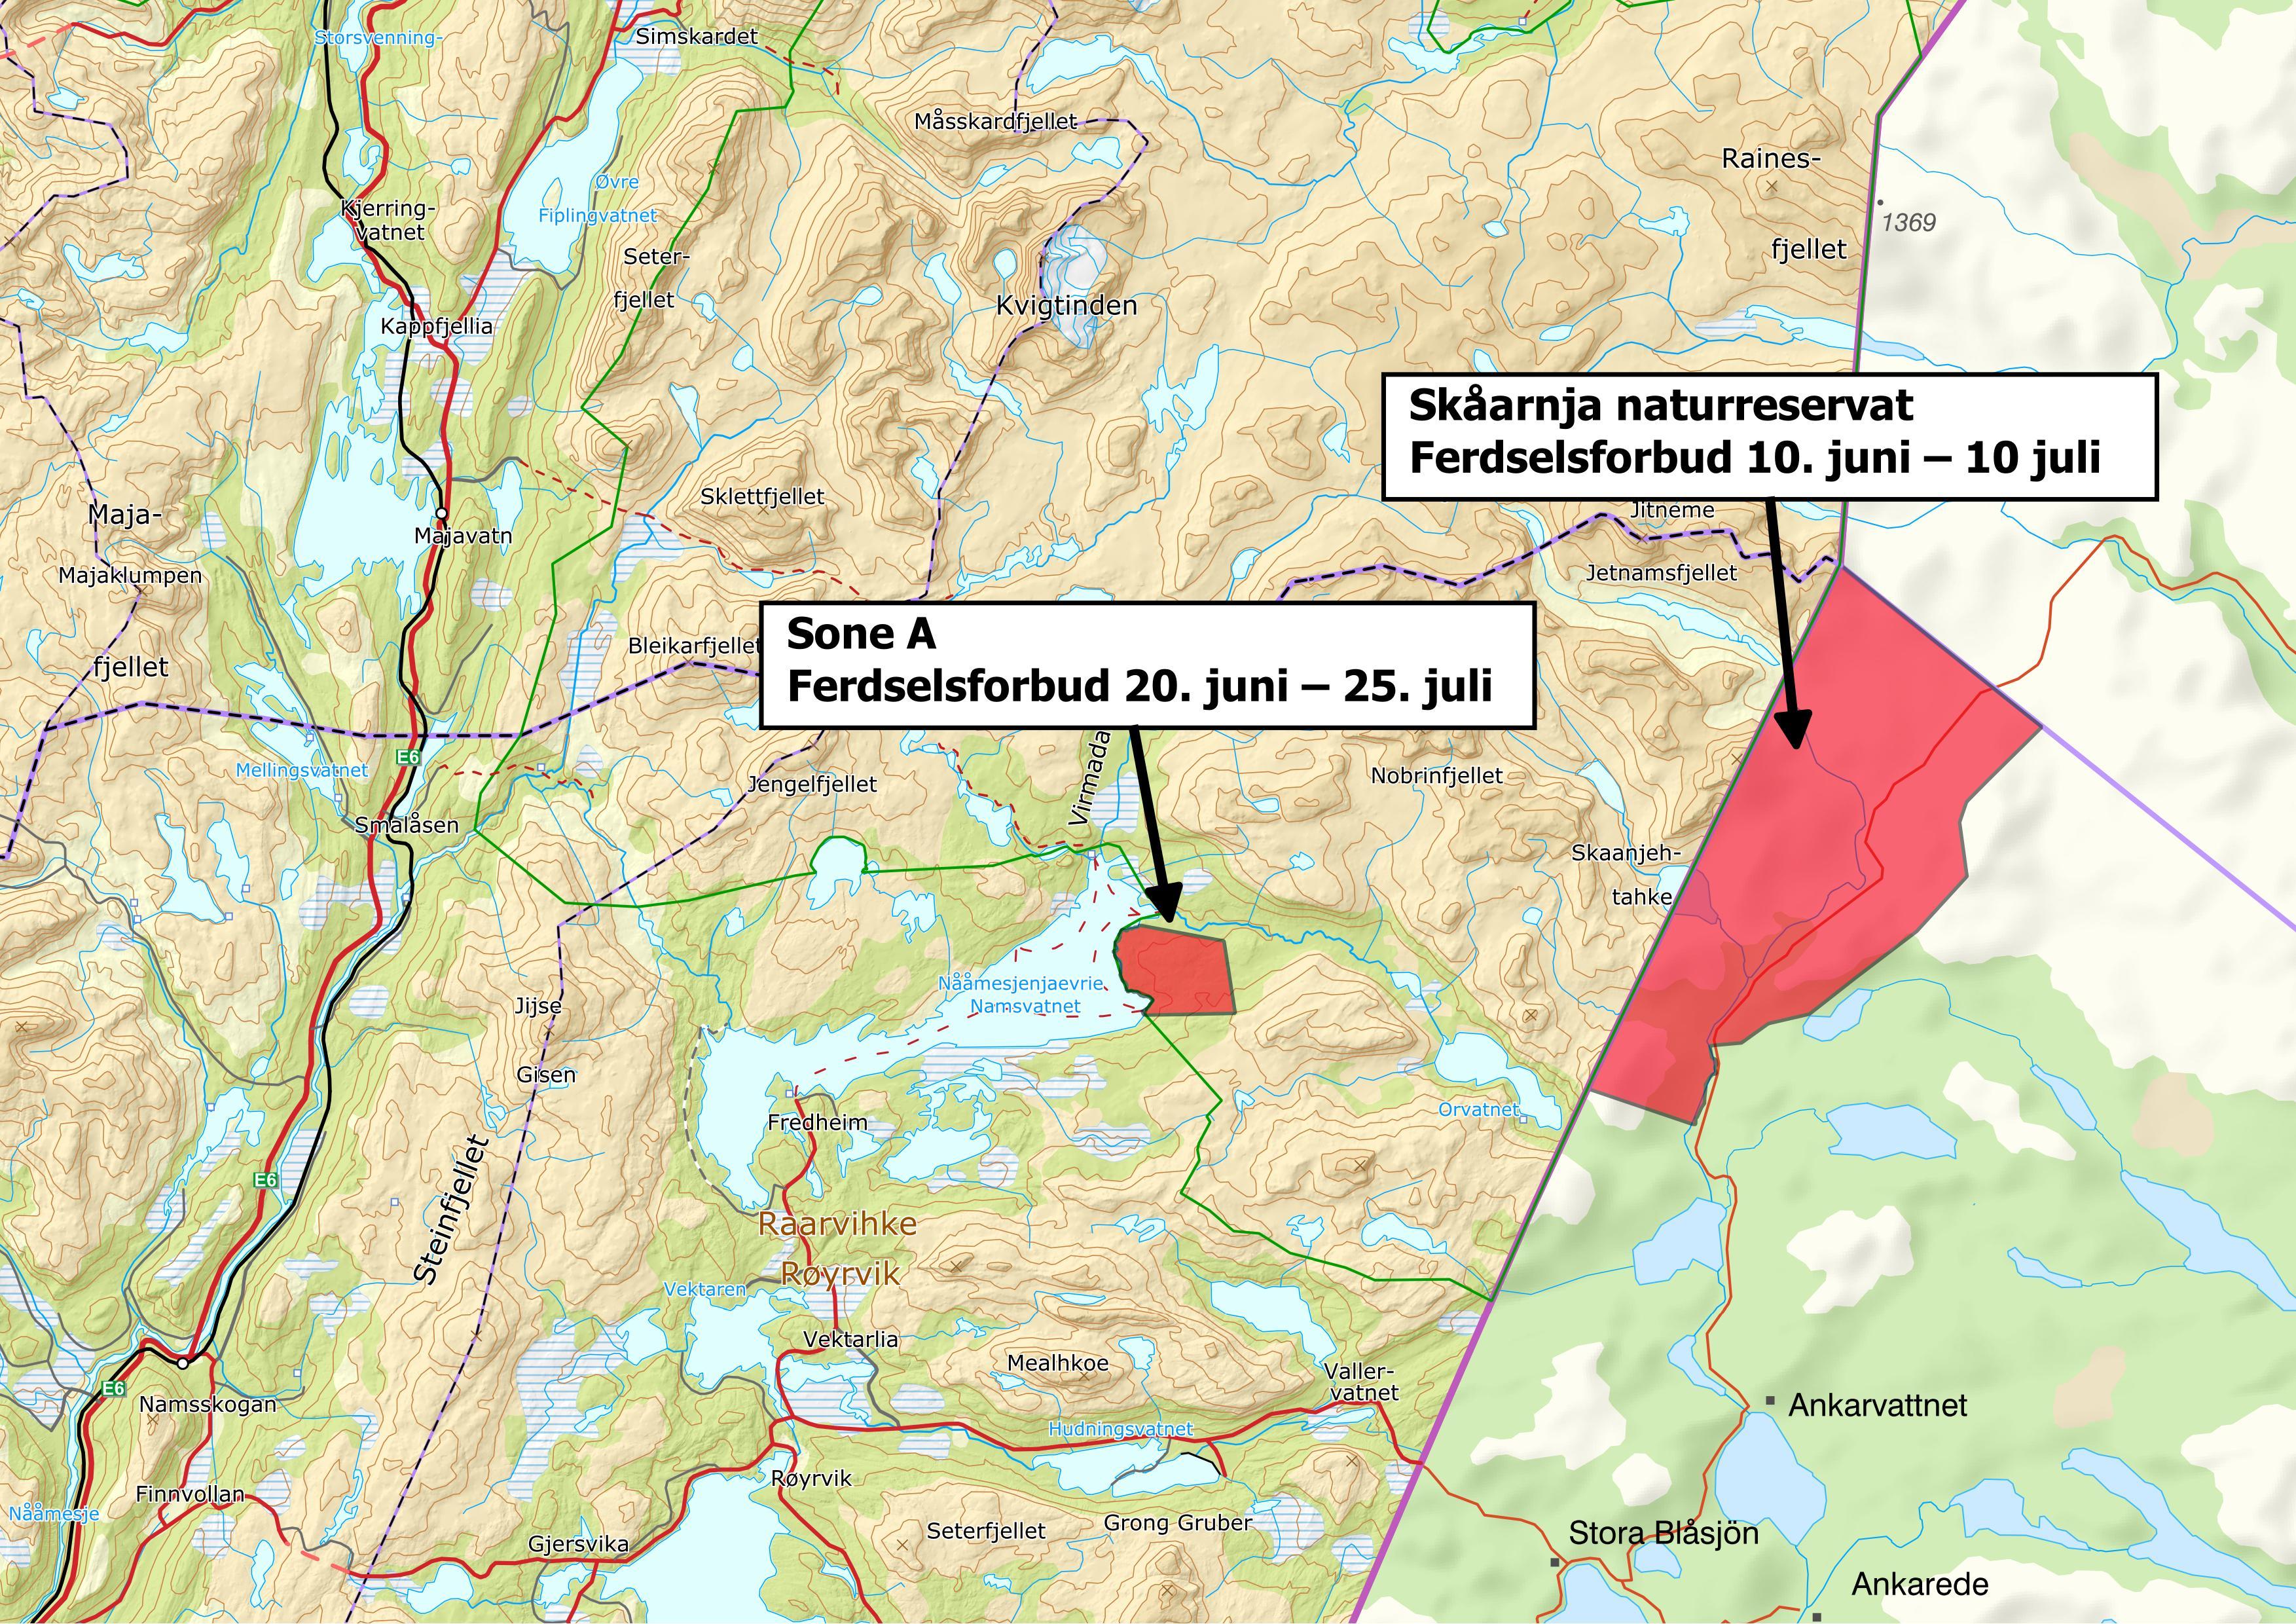 Kart Børgefjell ferdselsforbud